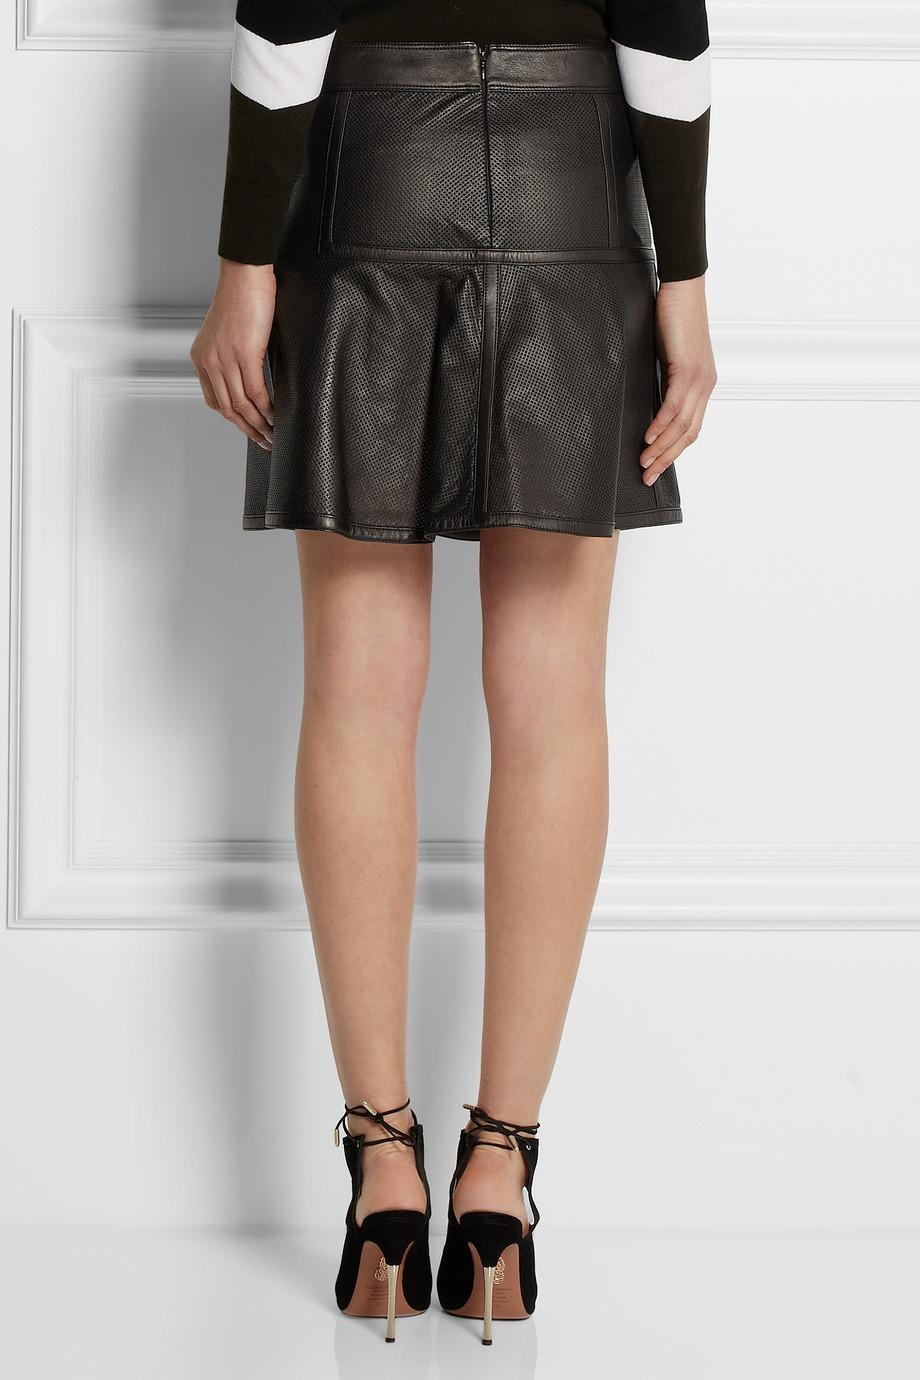 belstaff brompton perforated leather mini skirt in black